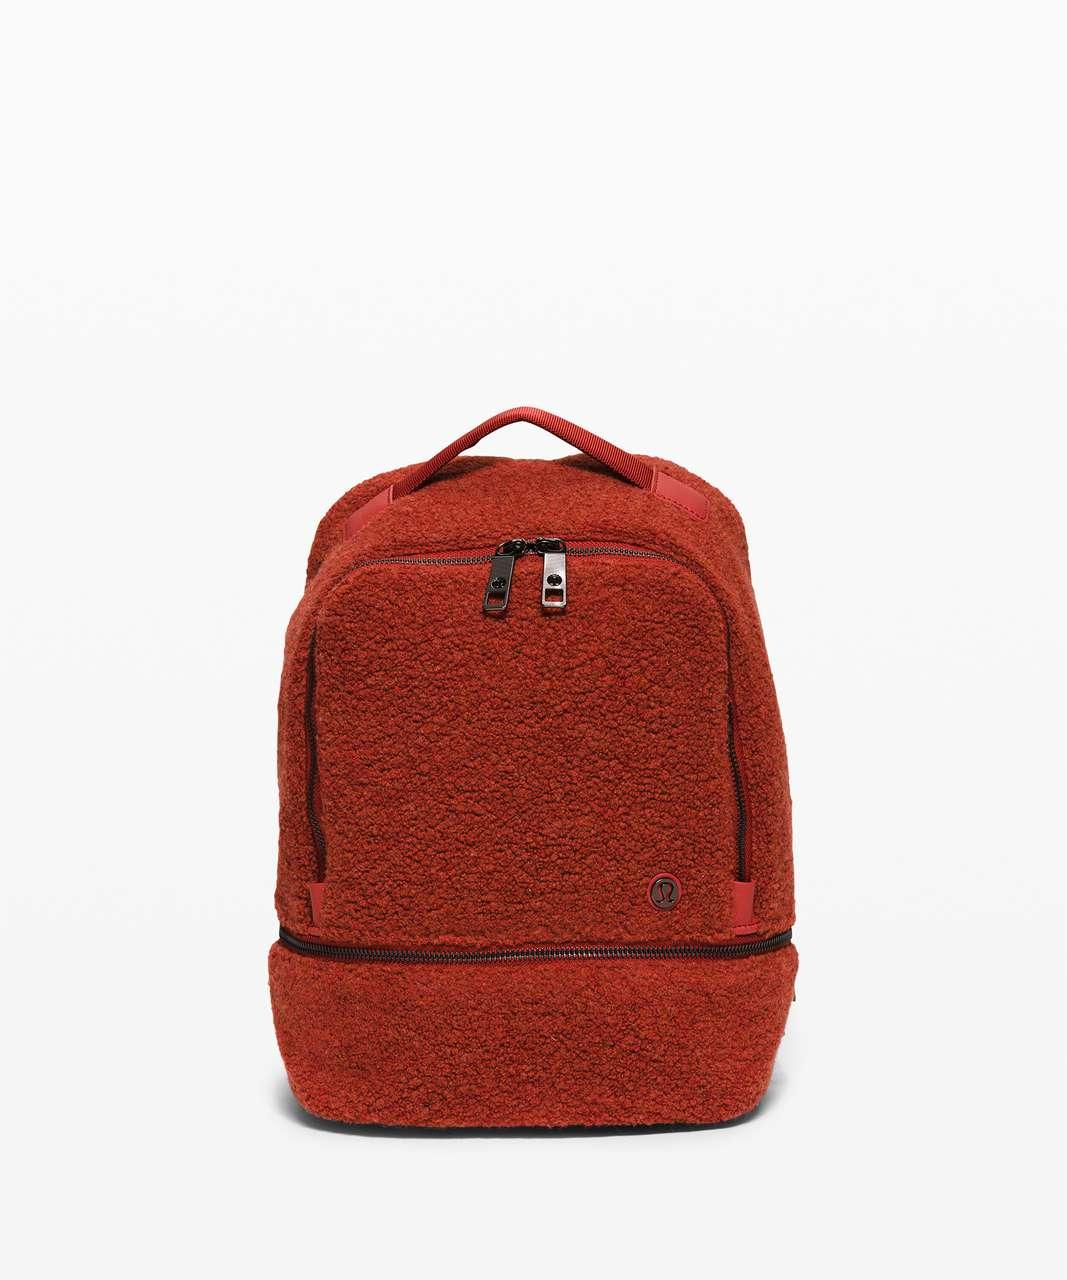 Lululemon City Adventurer Backpack Mini *Sherpa Fleece 10L - Heathered Magma